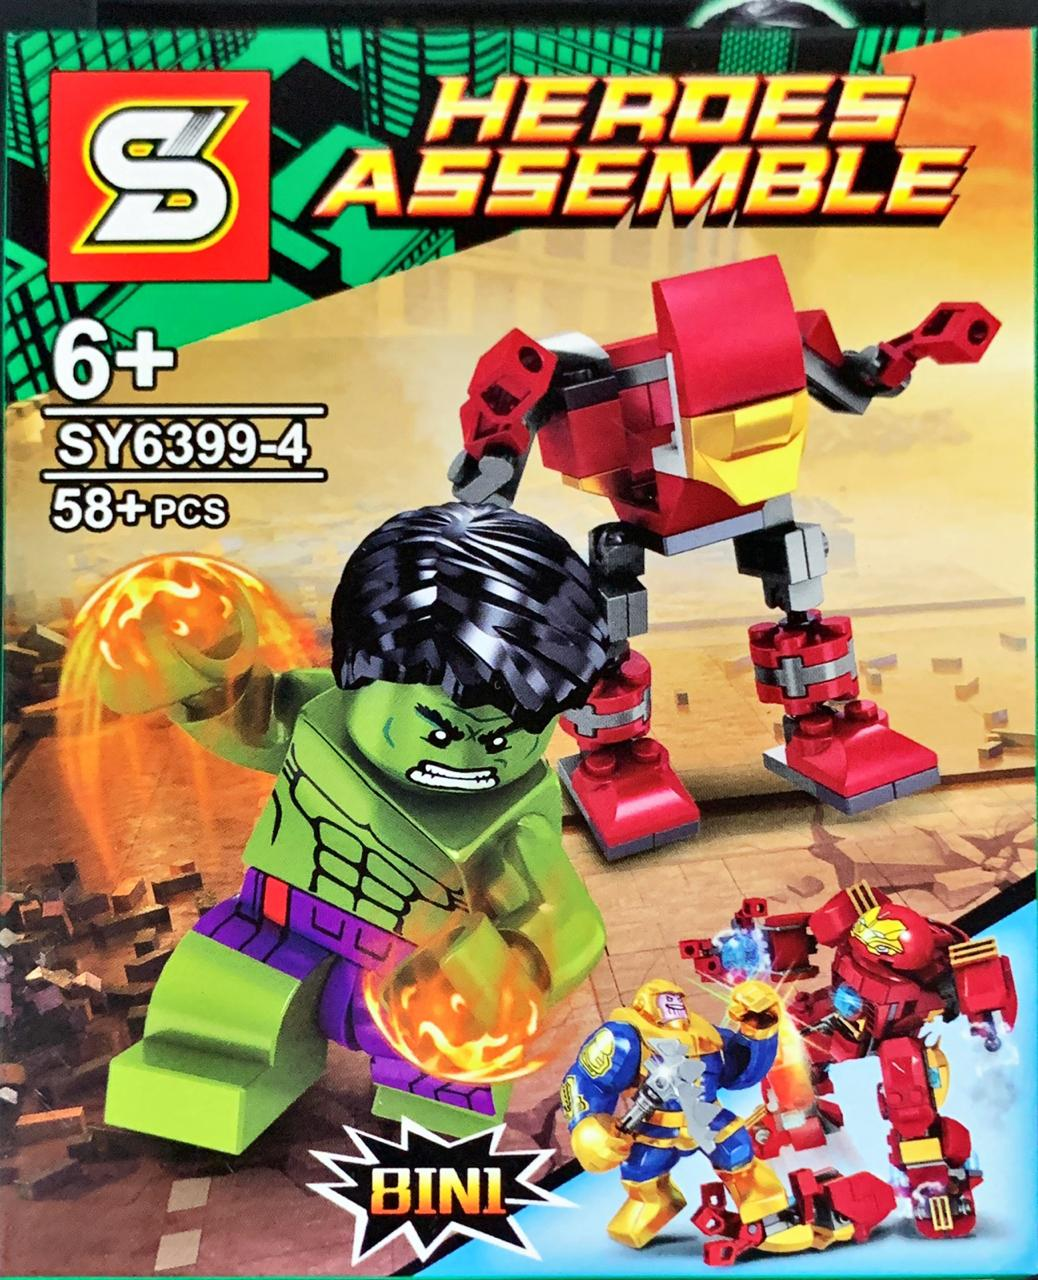 Bloco de Montar Heroes Assemble: Hulk (SY6399-4) - (58 Peças)